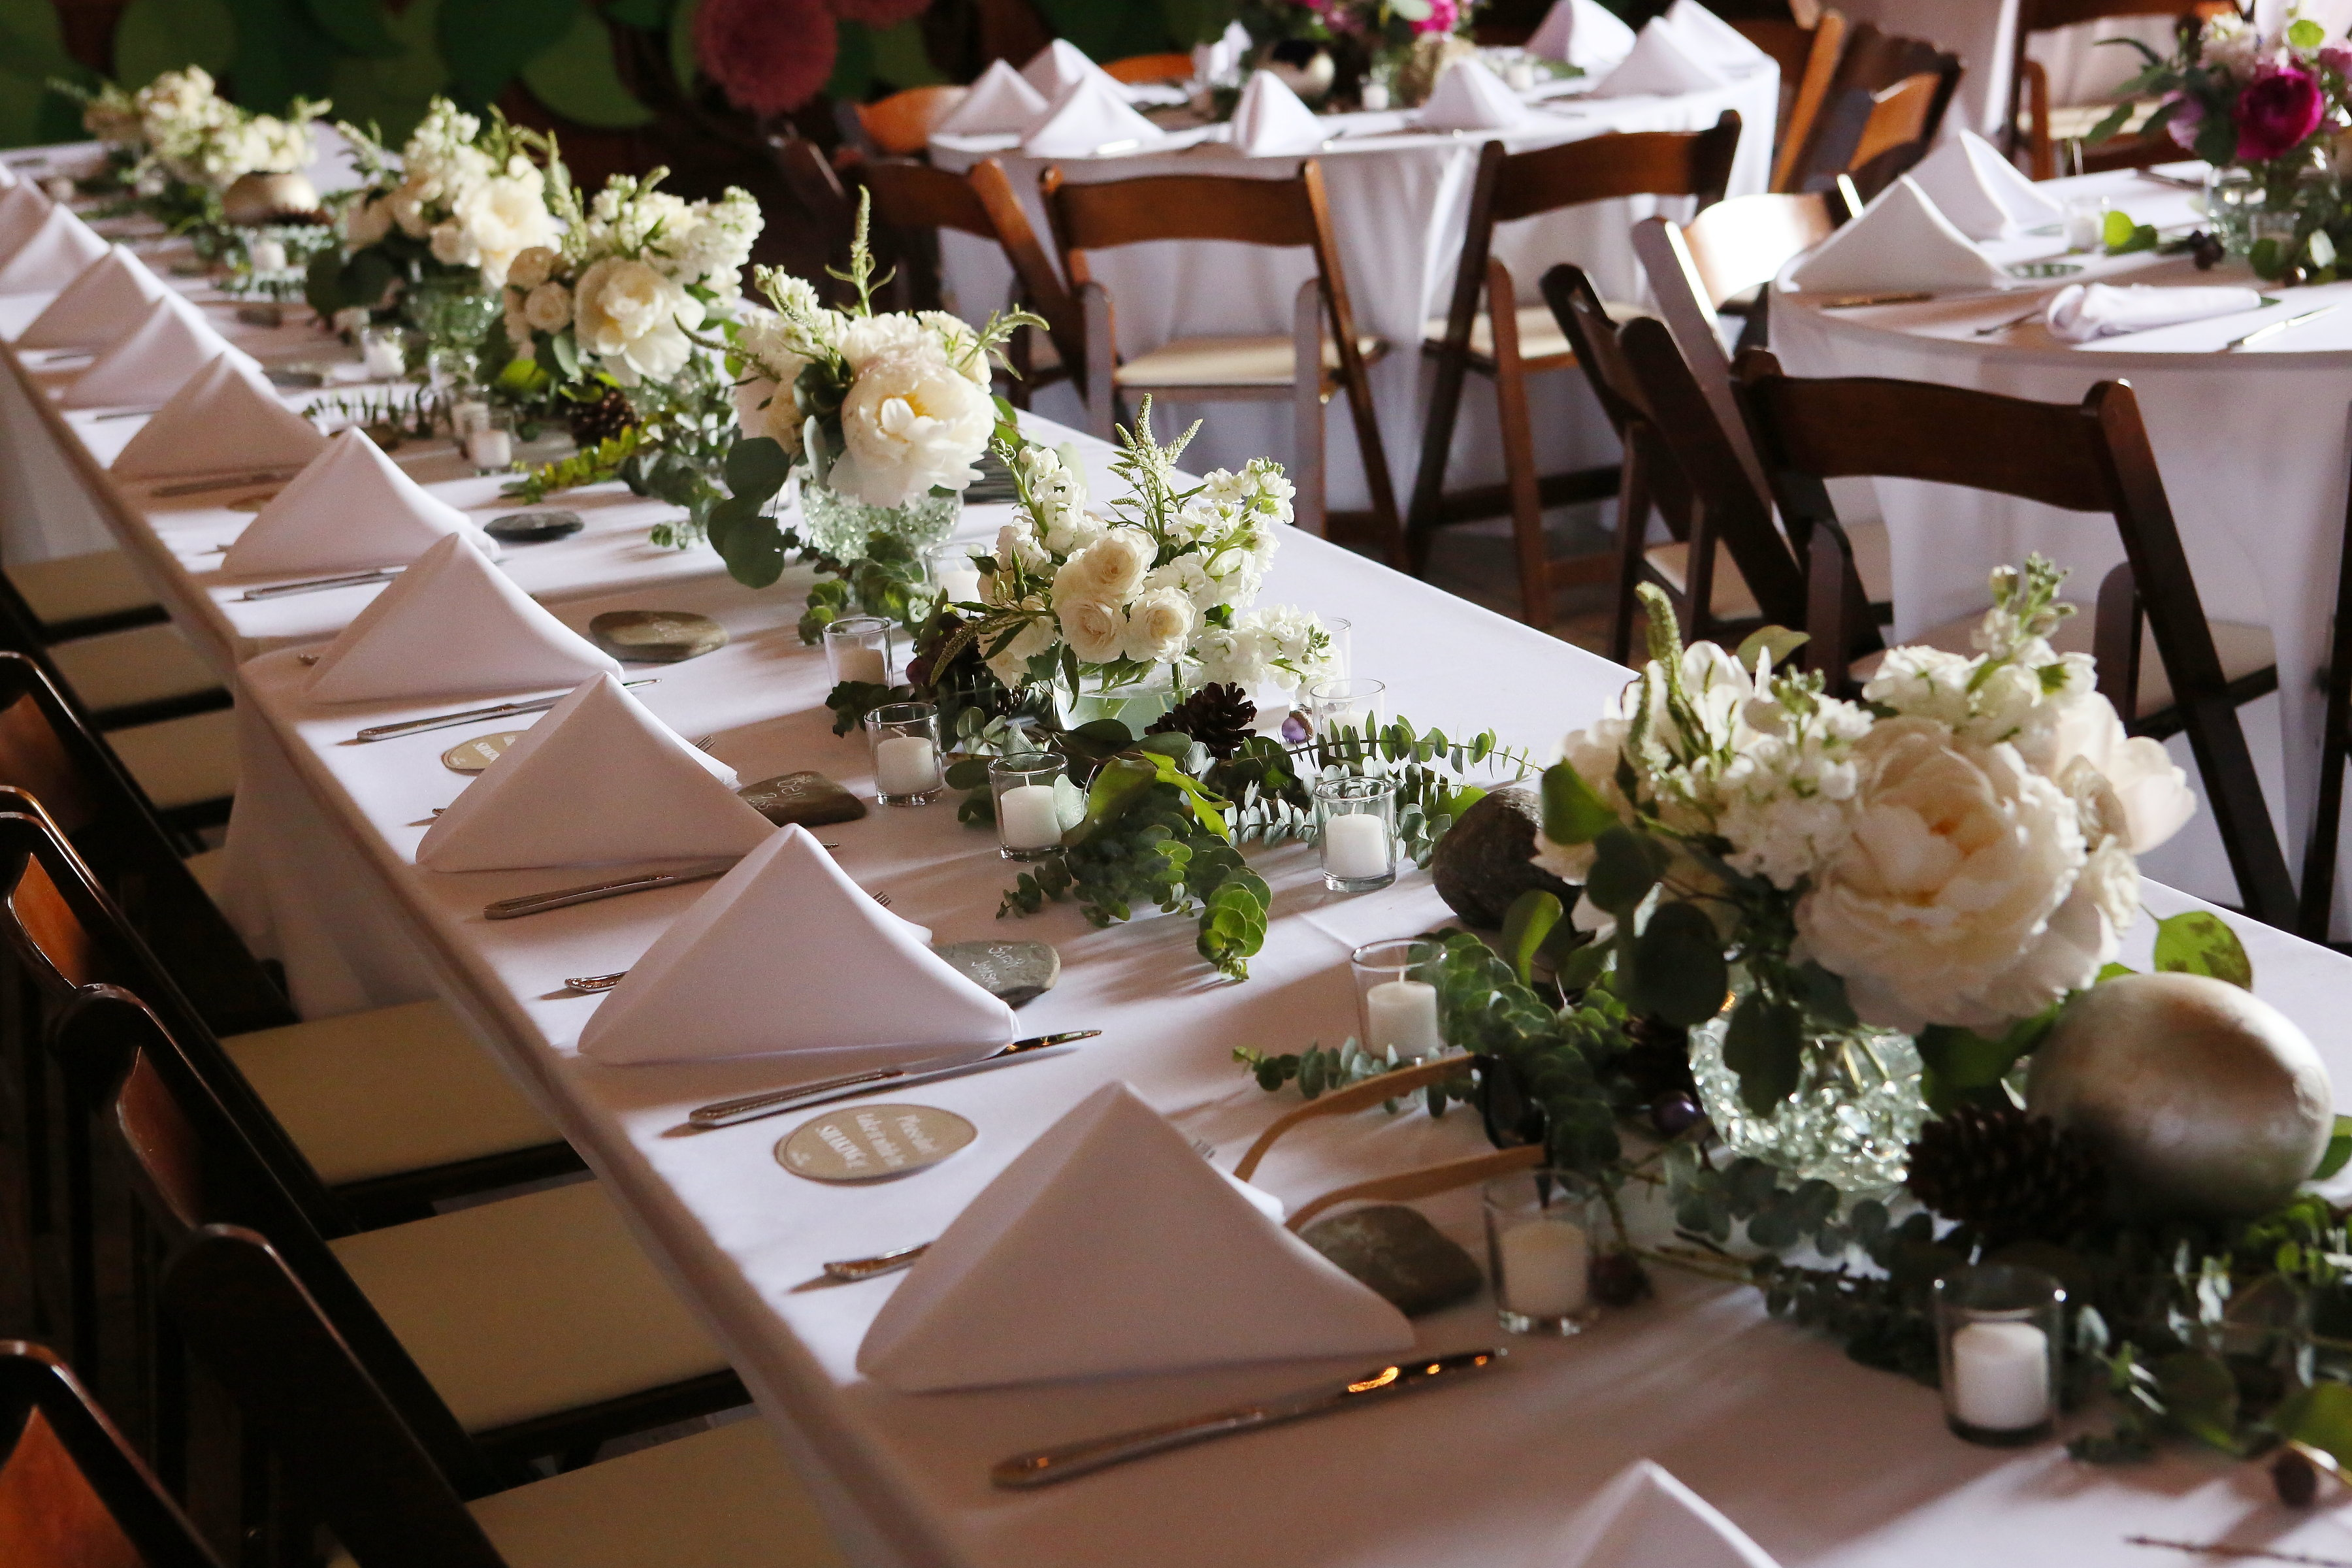 Lauren & Tom Wedding Photo Gallery - Fairy Tale Weddings ...